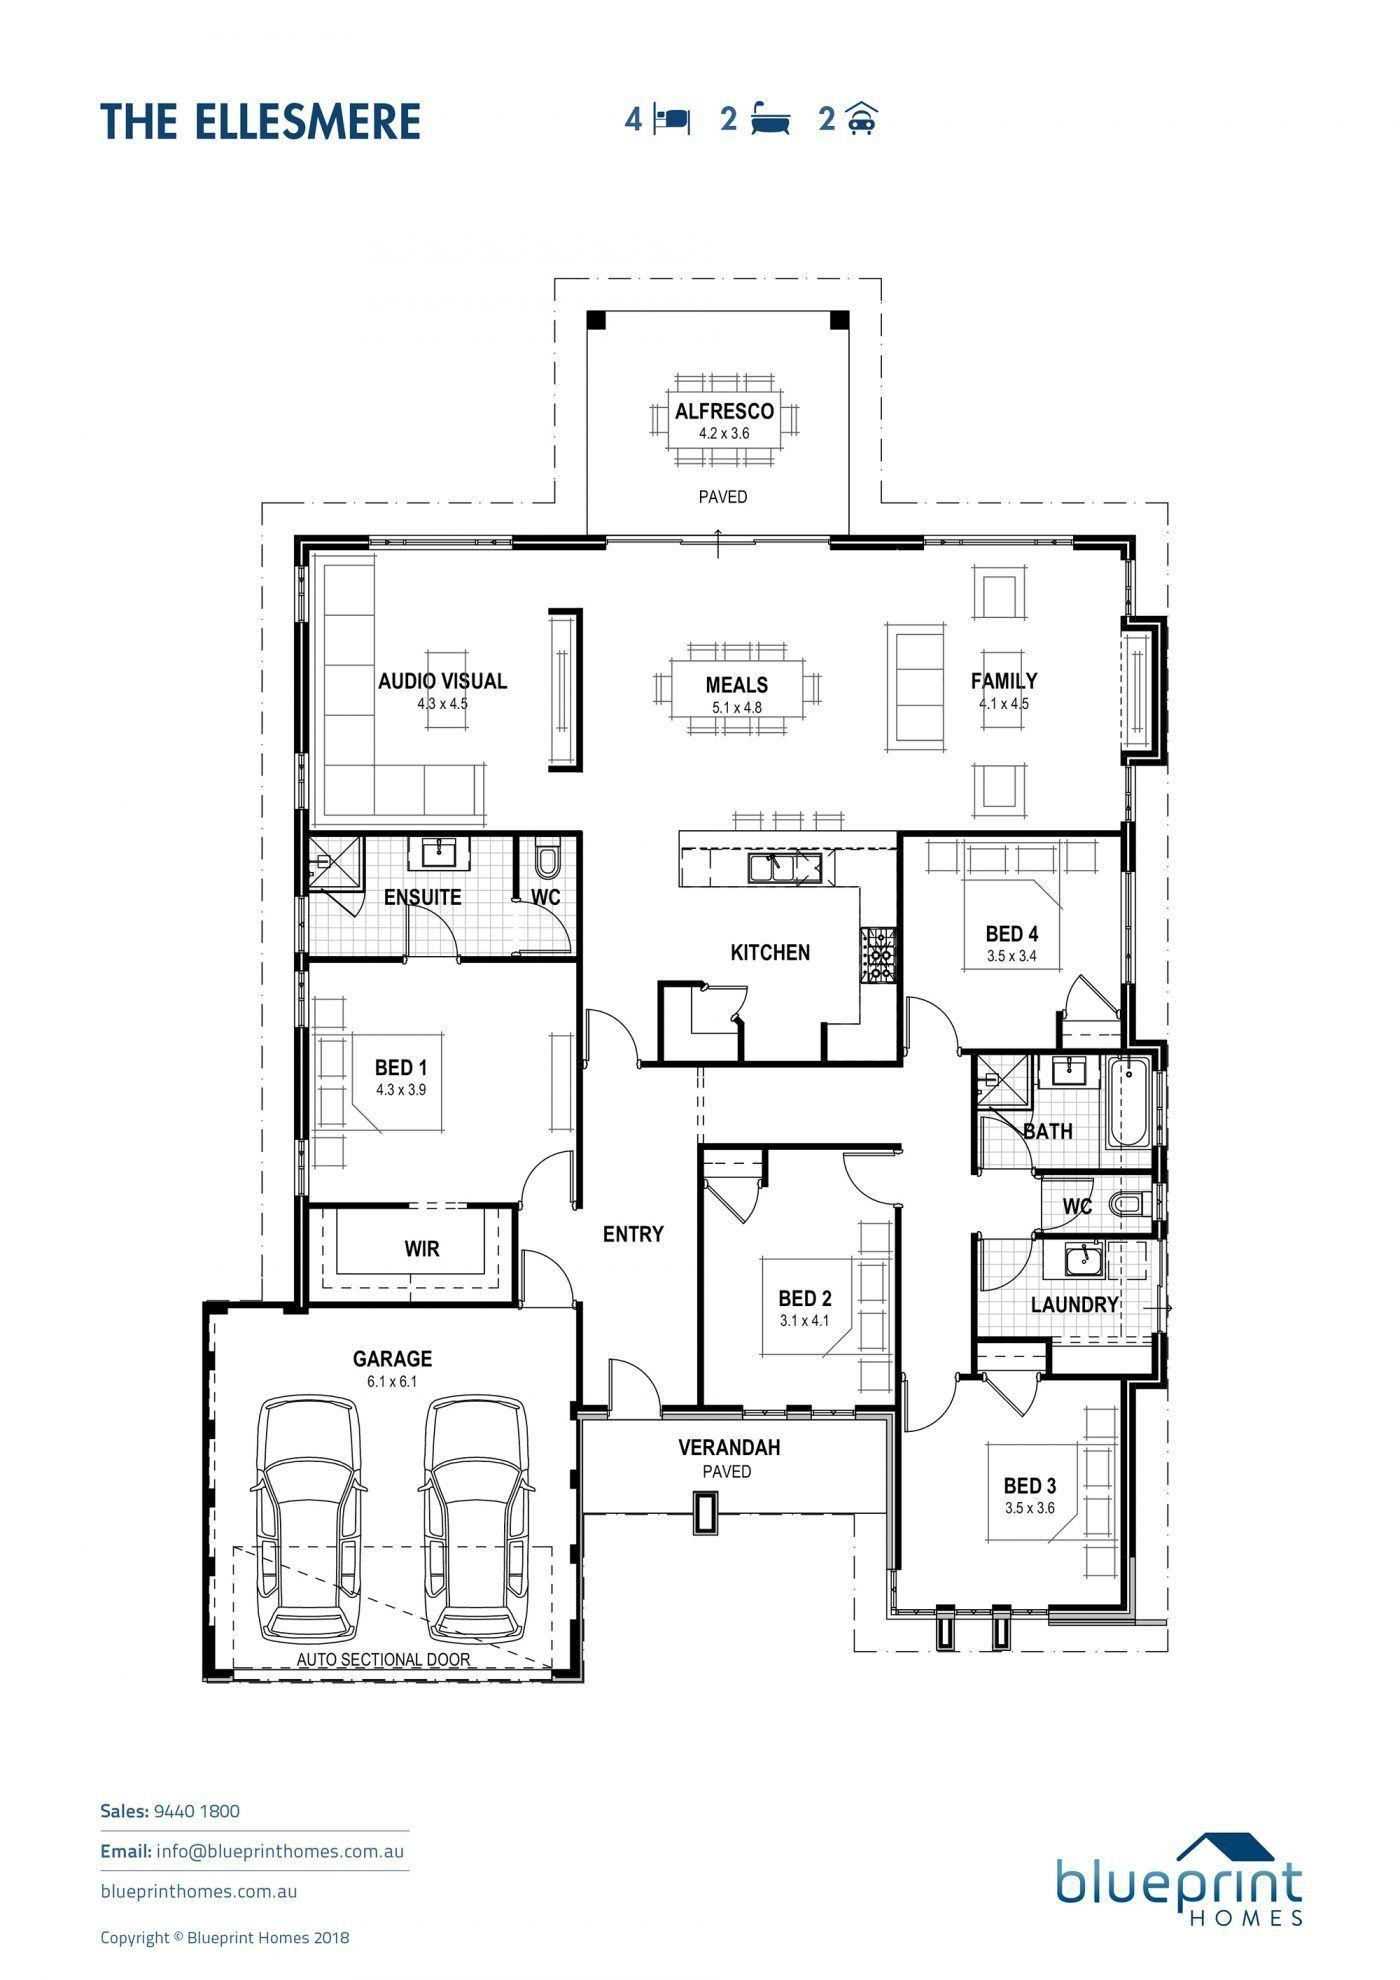 Home Builders House Plans 2021 House Plans Home Builders House Design